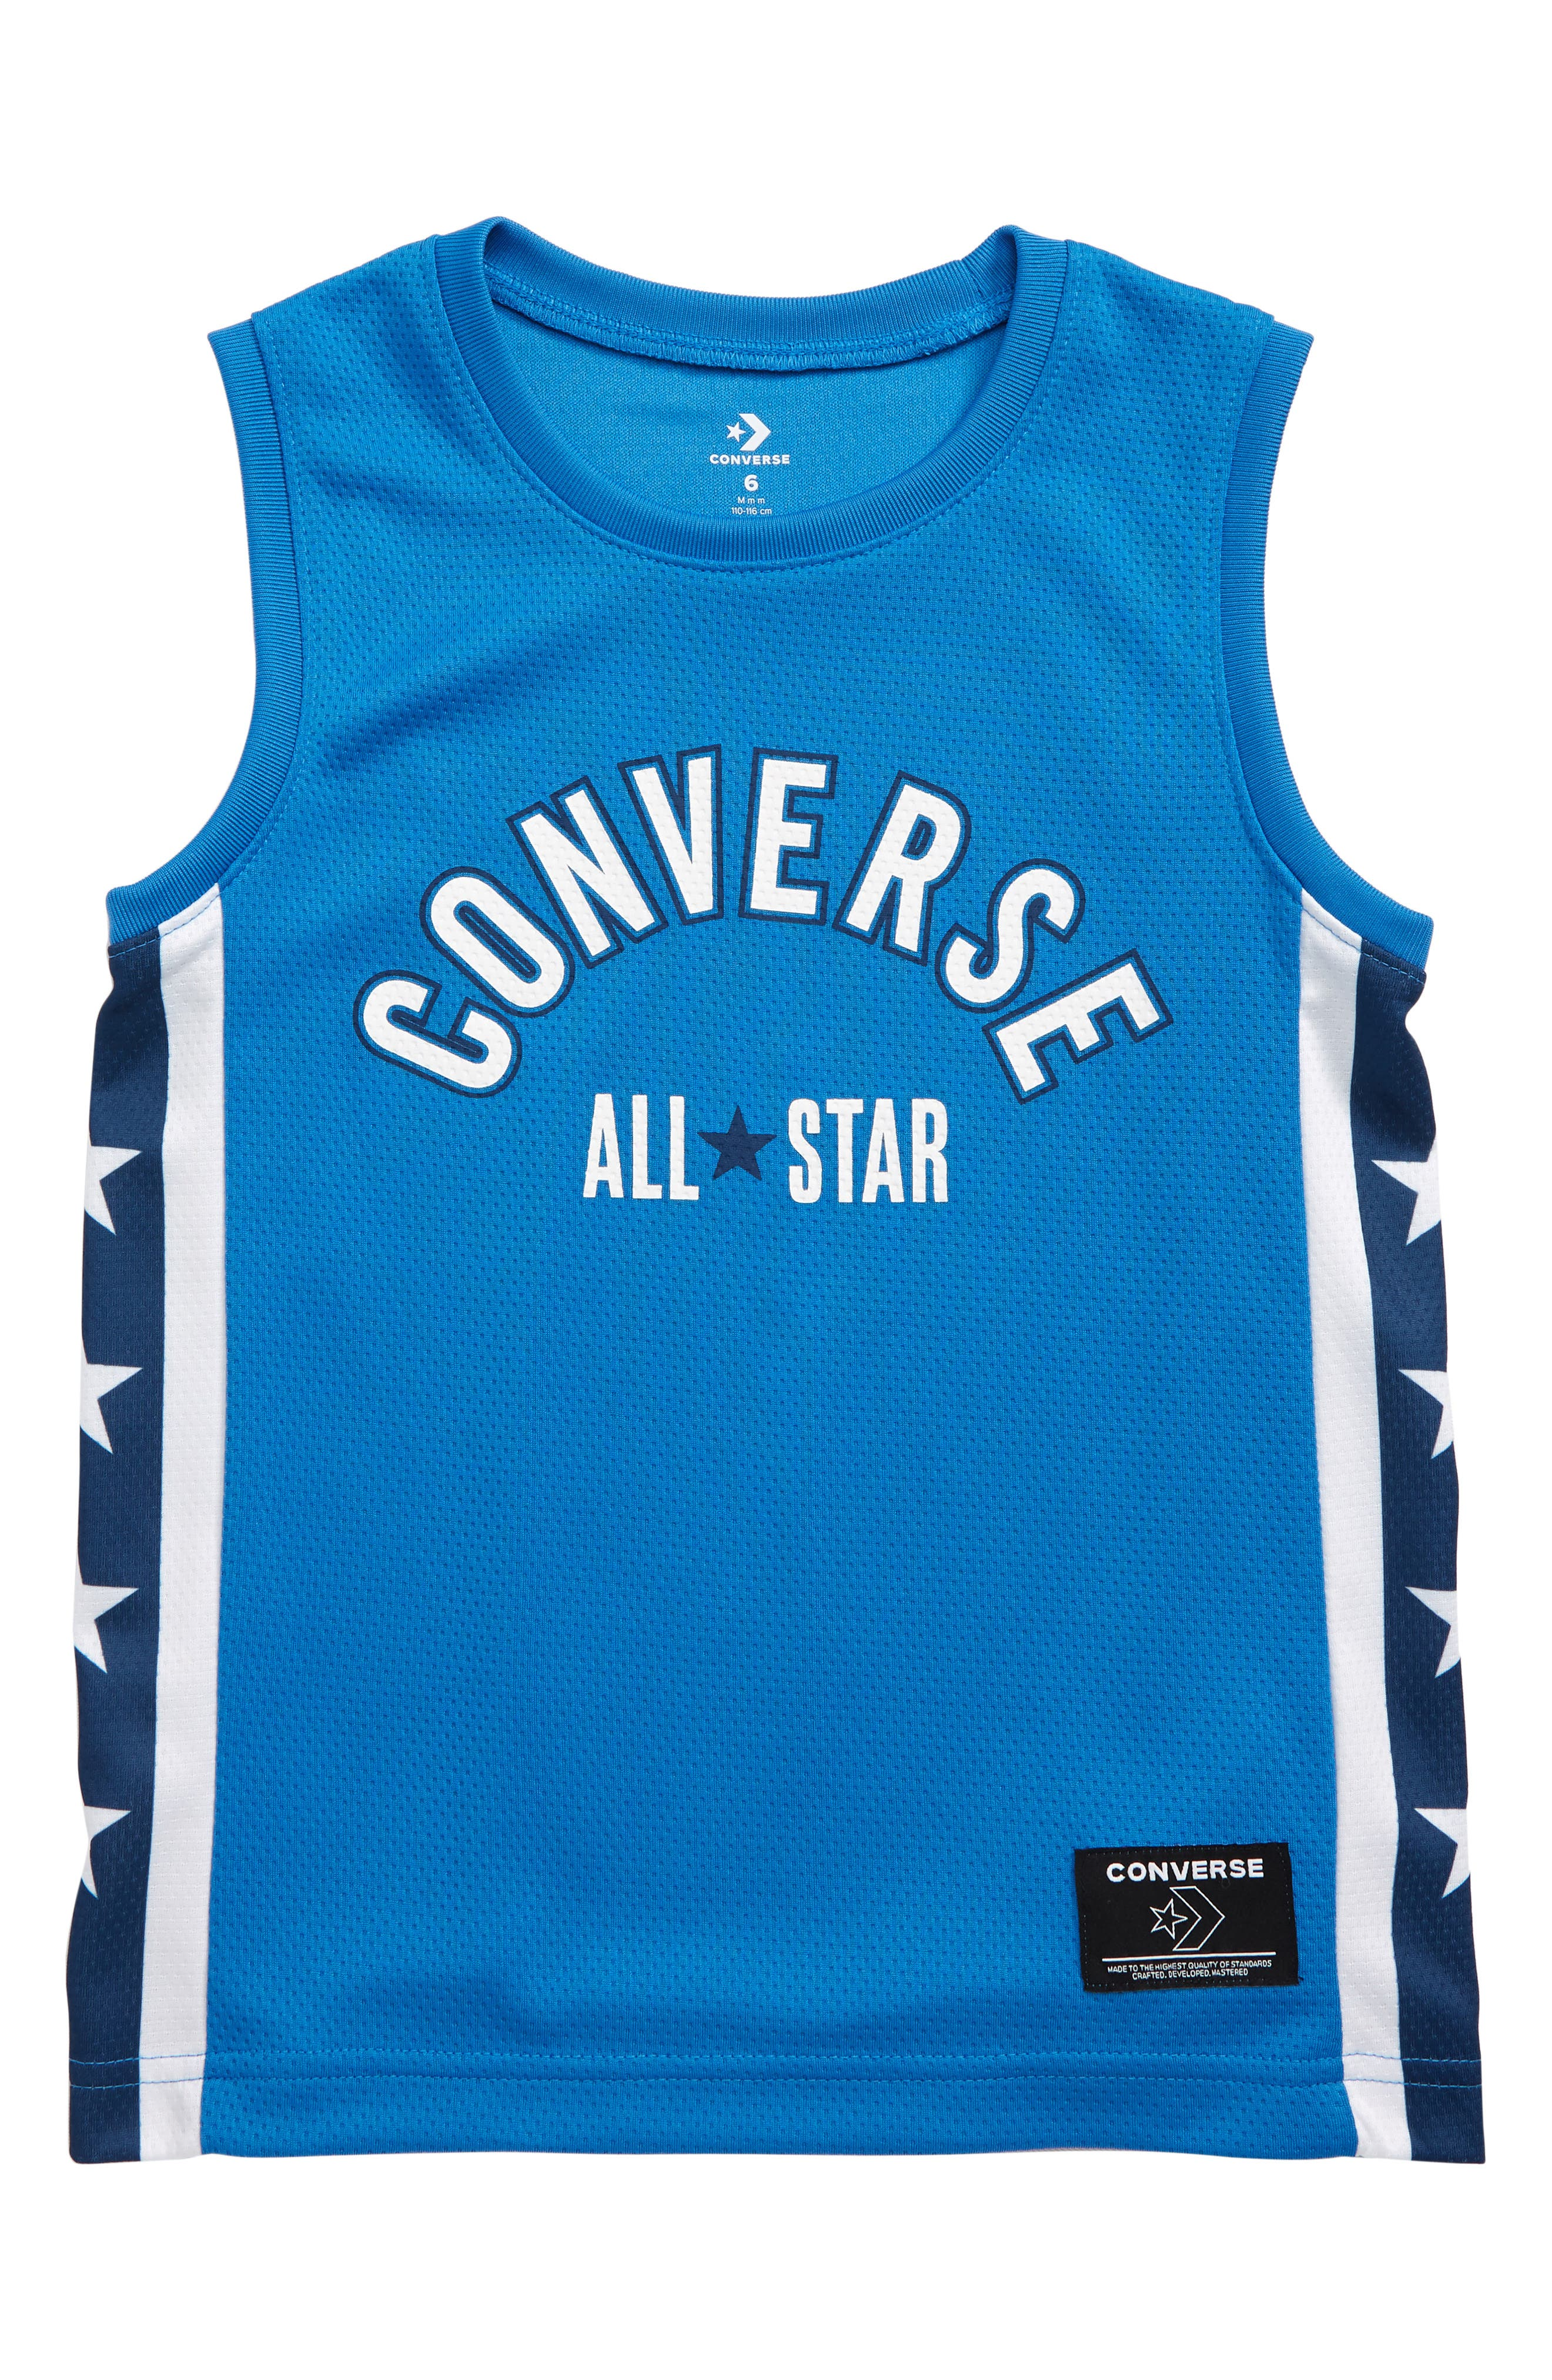 Boys Converse Star Stripe Mesh Jersey Shirt Size 6  Blue